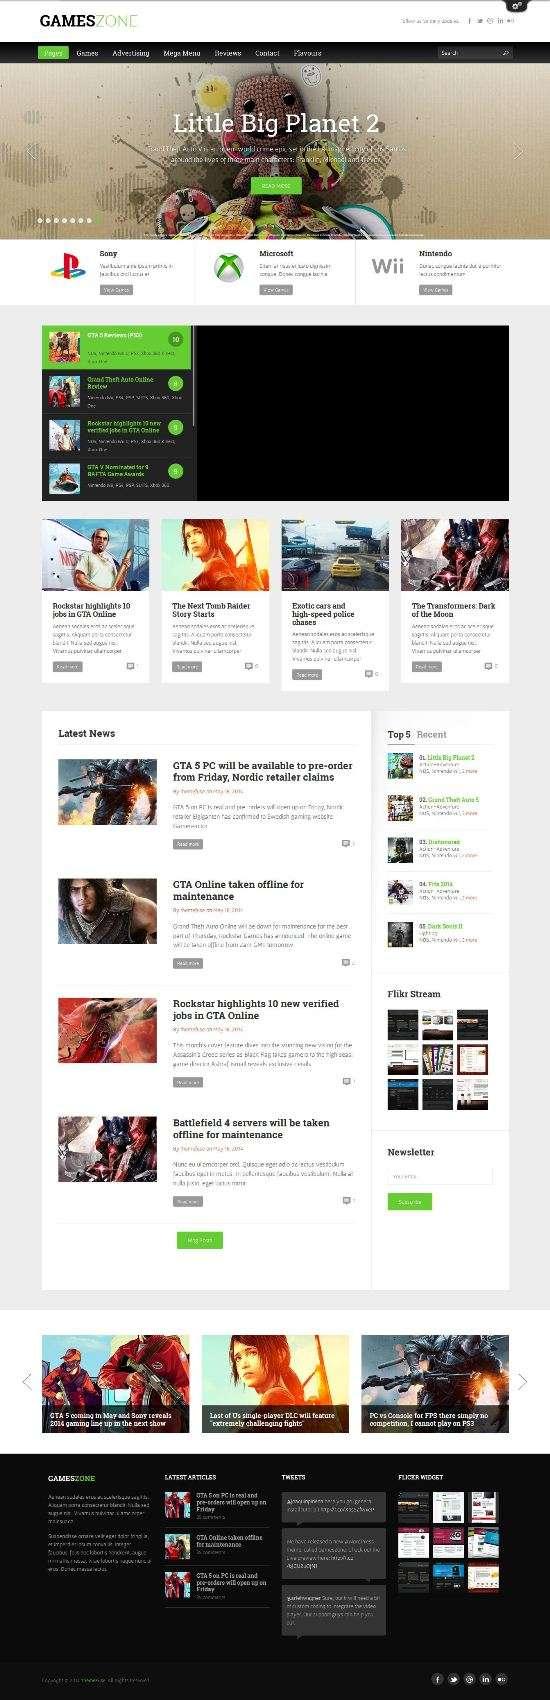 gameszone themefuse avjthemescom 01 - Gameszone WordPress Theme